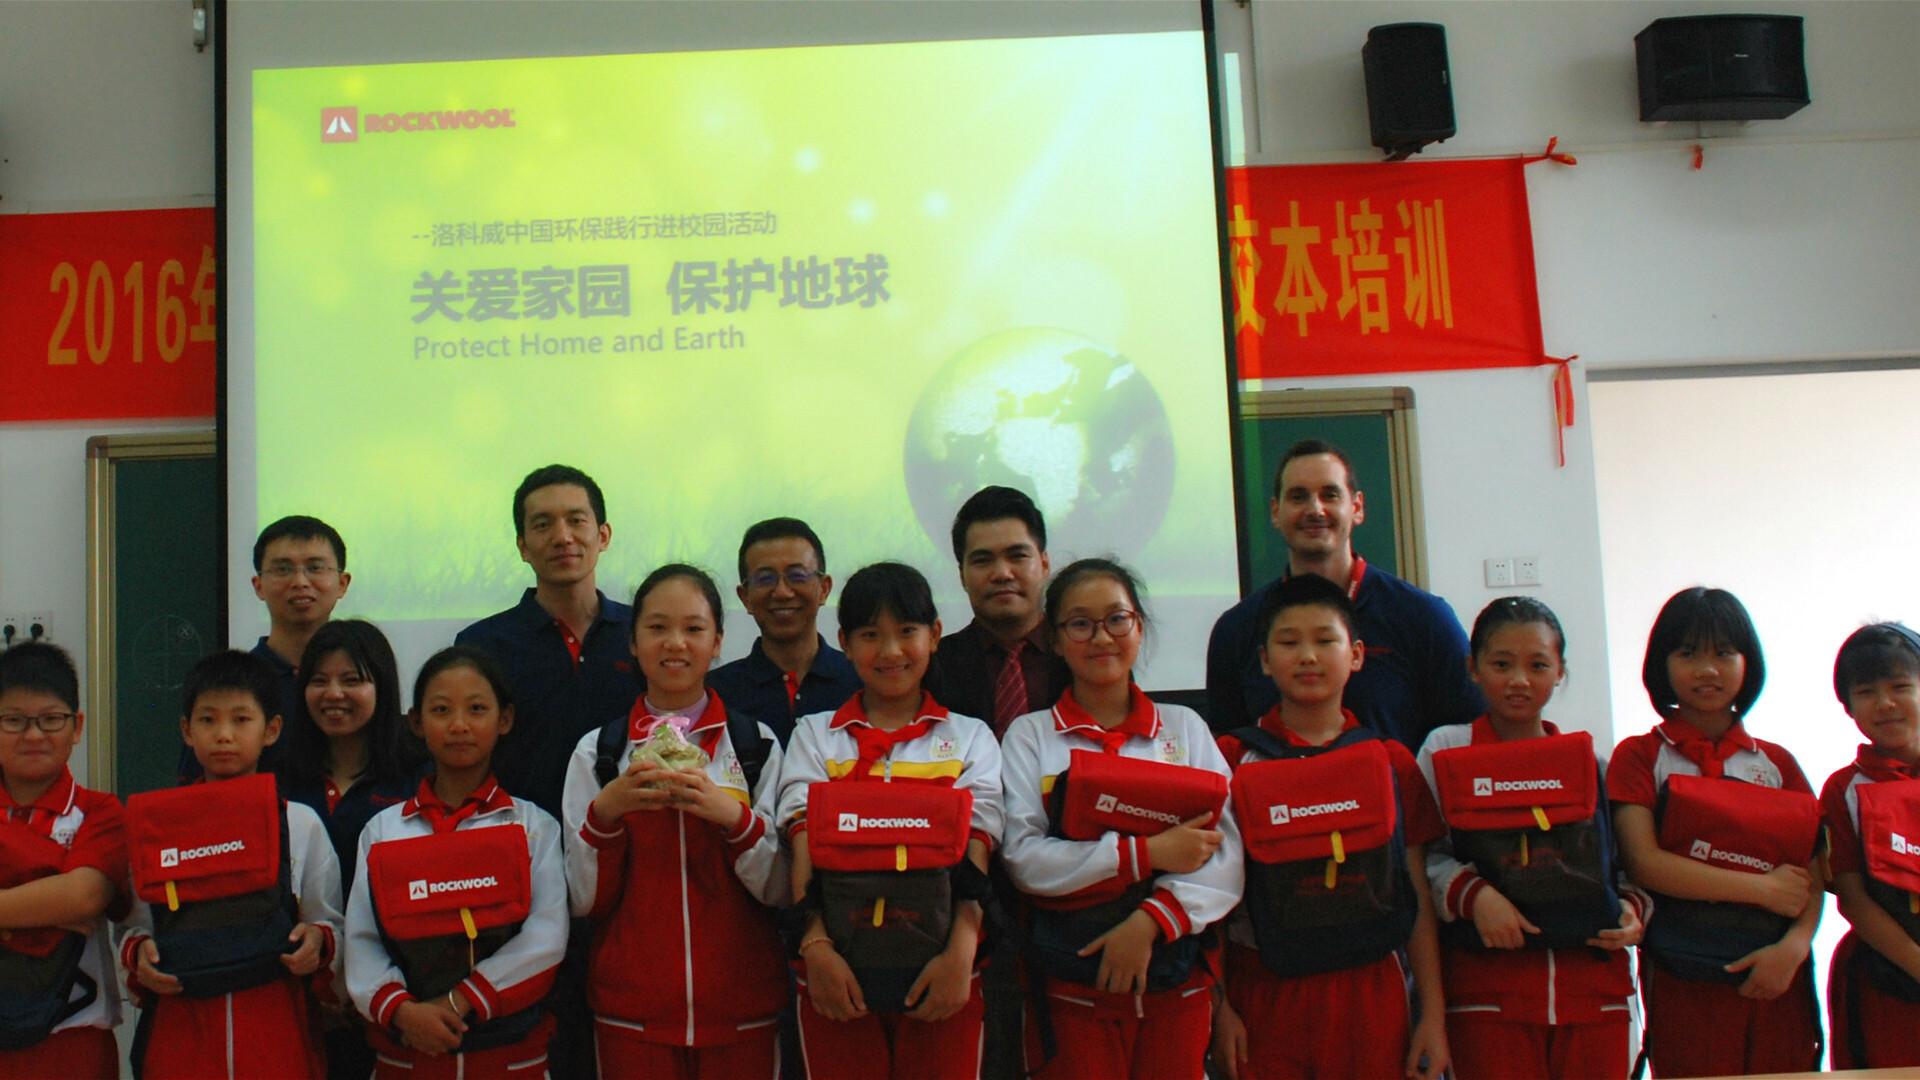 Hefeng school charity event image